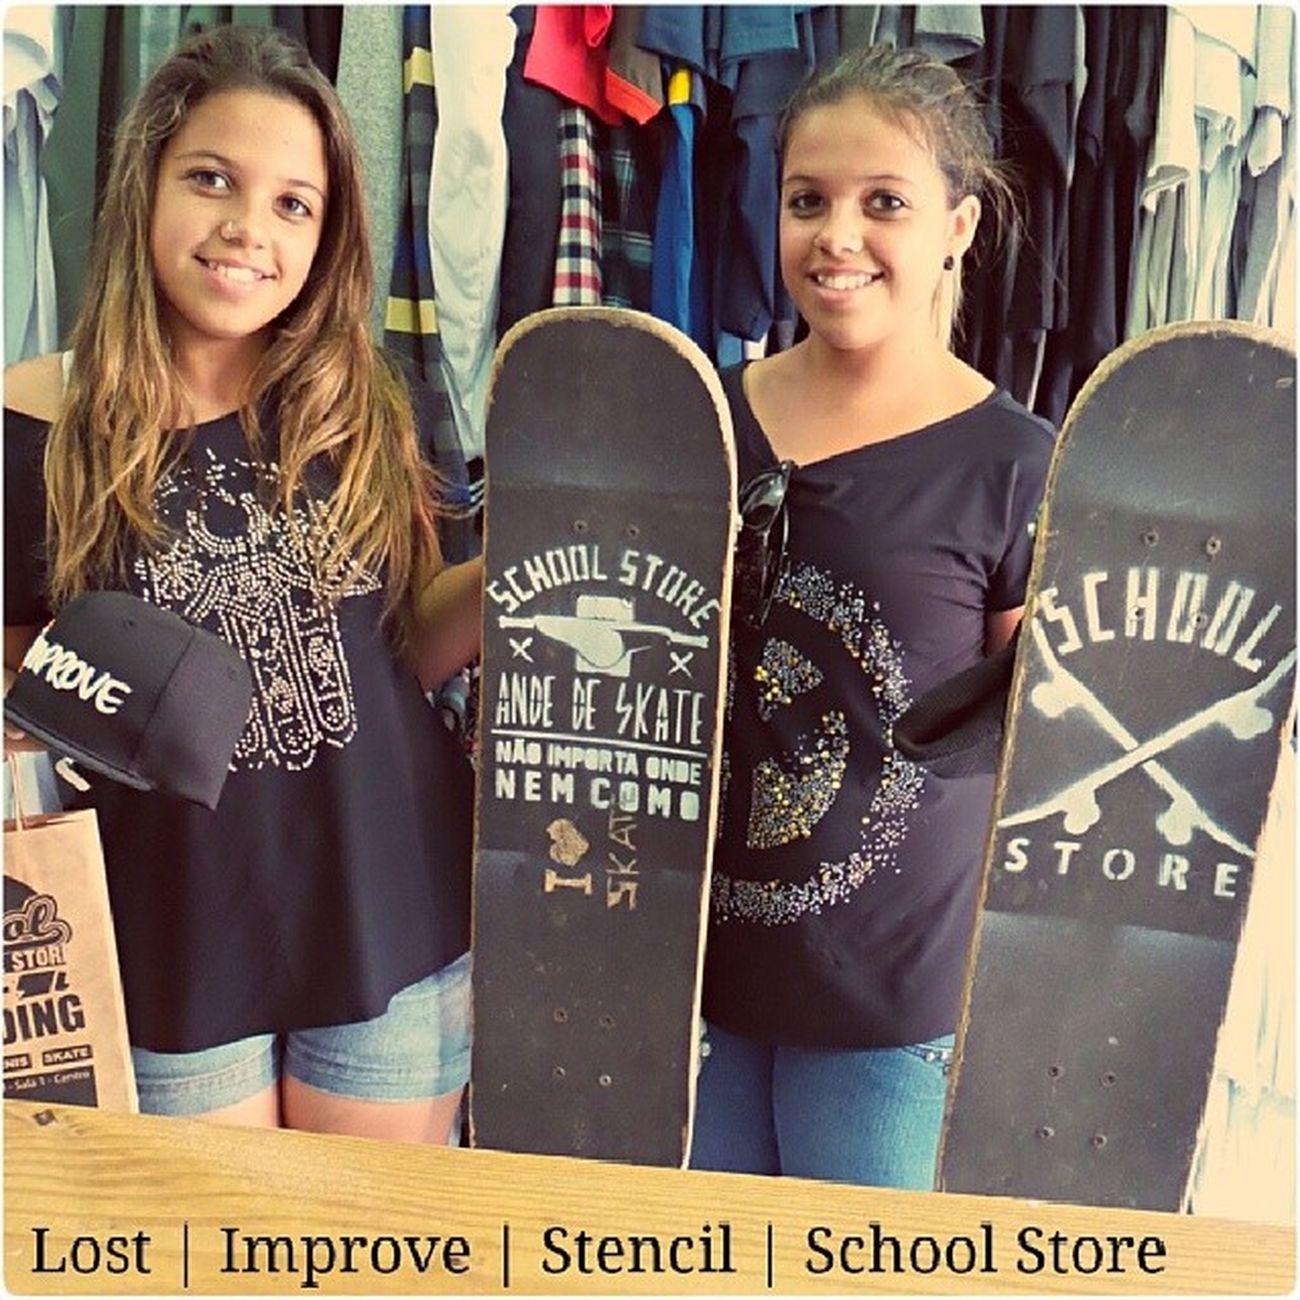 Valeu meninas por passarem na @schoolstore Stencil Meia Lost Bone  improve skate skateboard skateallday schoolstore school store core lifestyle urbanwear skateshop boardshop siga followme follow me